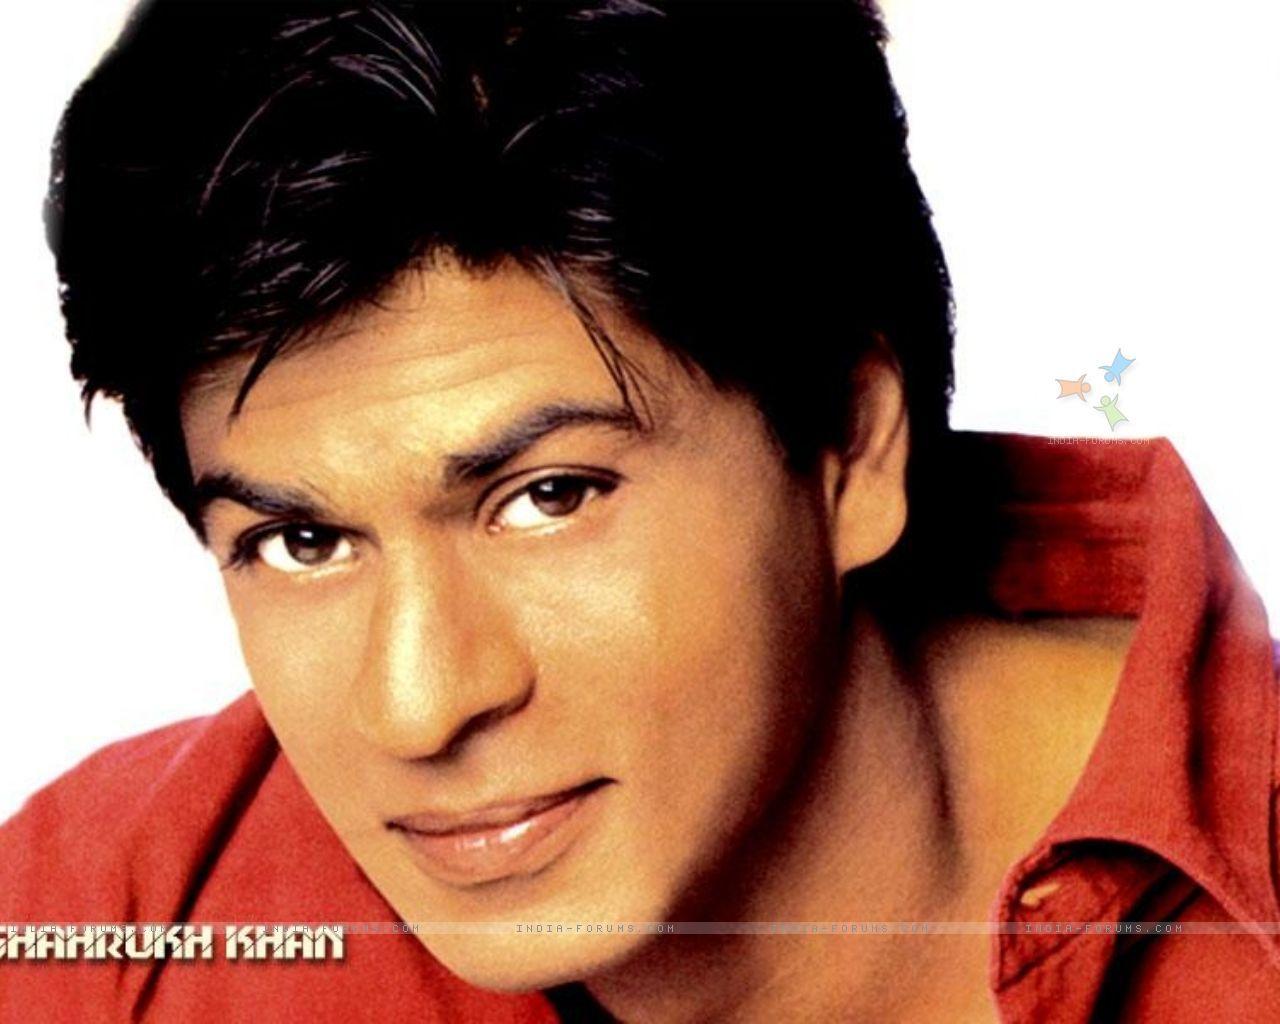 Shahrukh Khan biography, profile, biodata, height, age